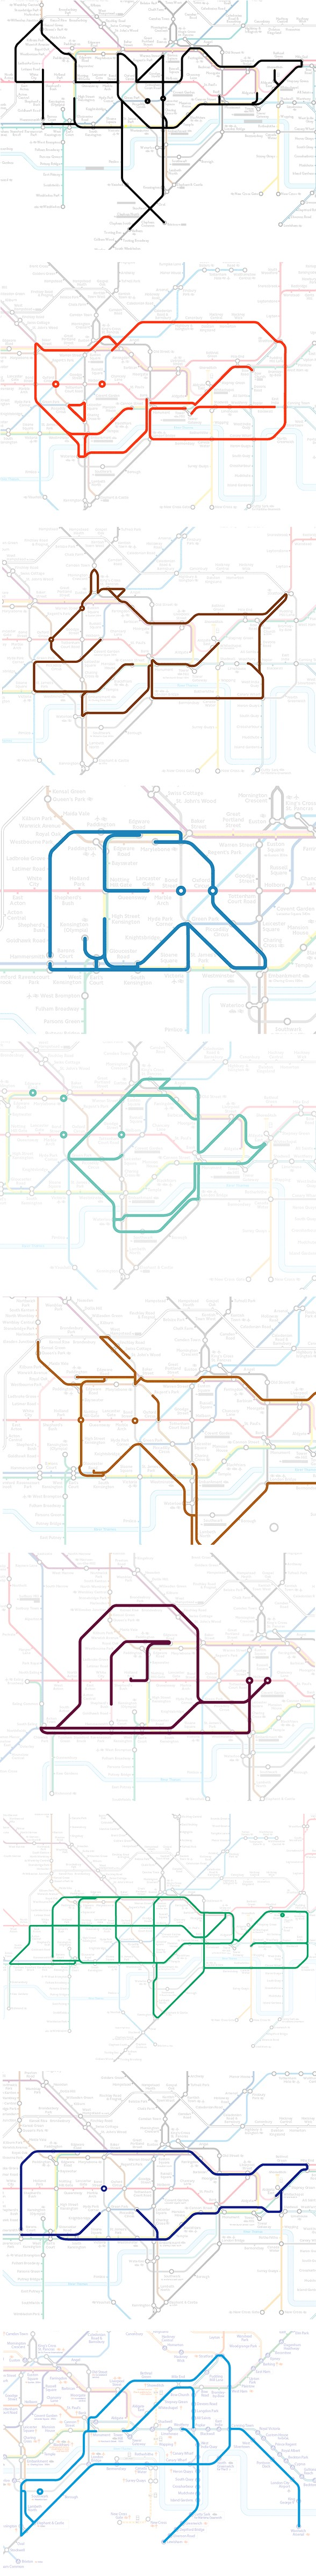 map animal